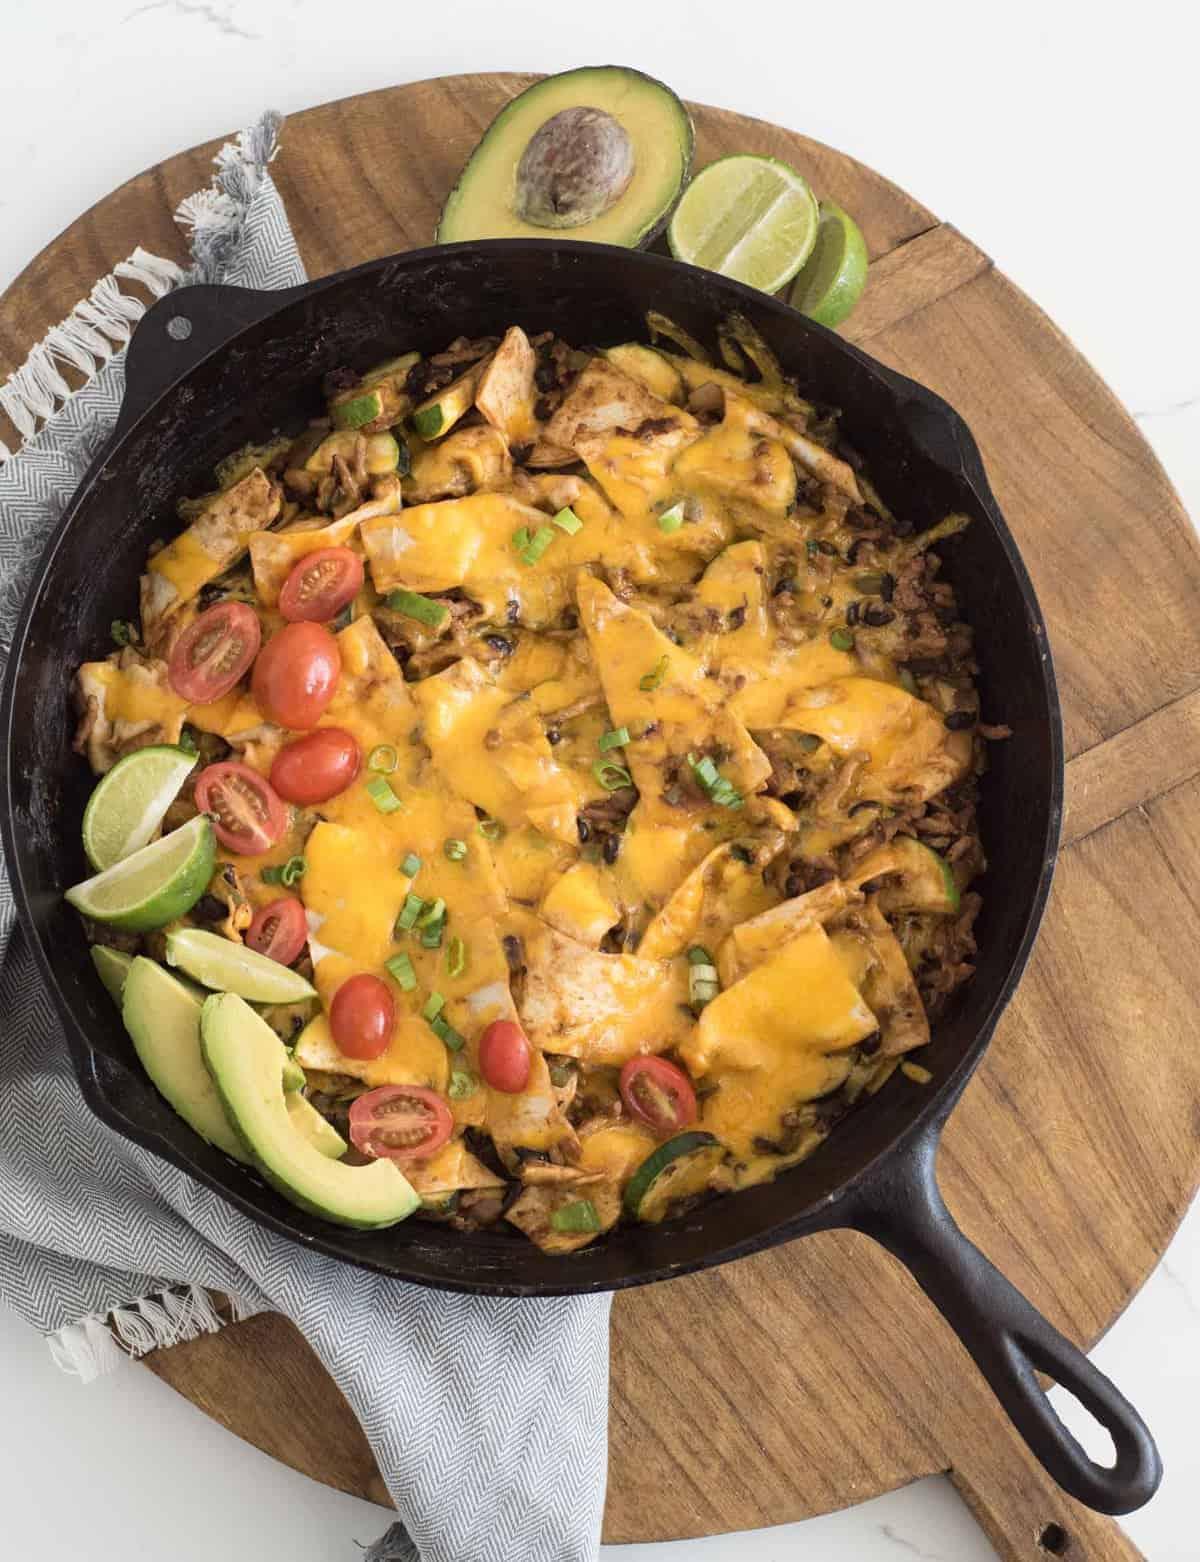 Pan of chicken enchilada casserole